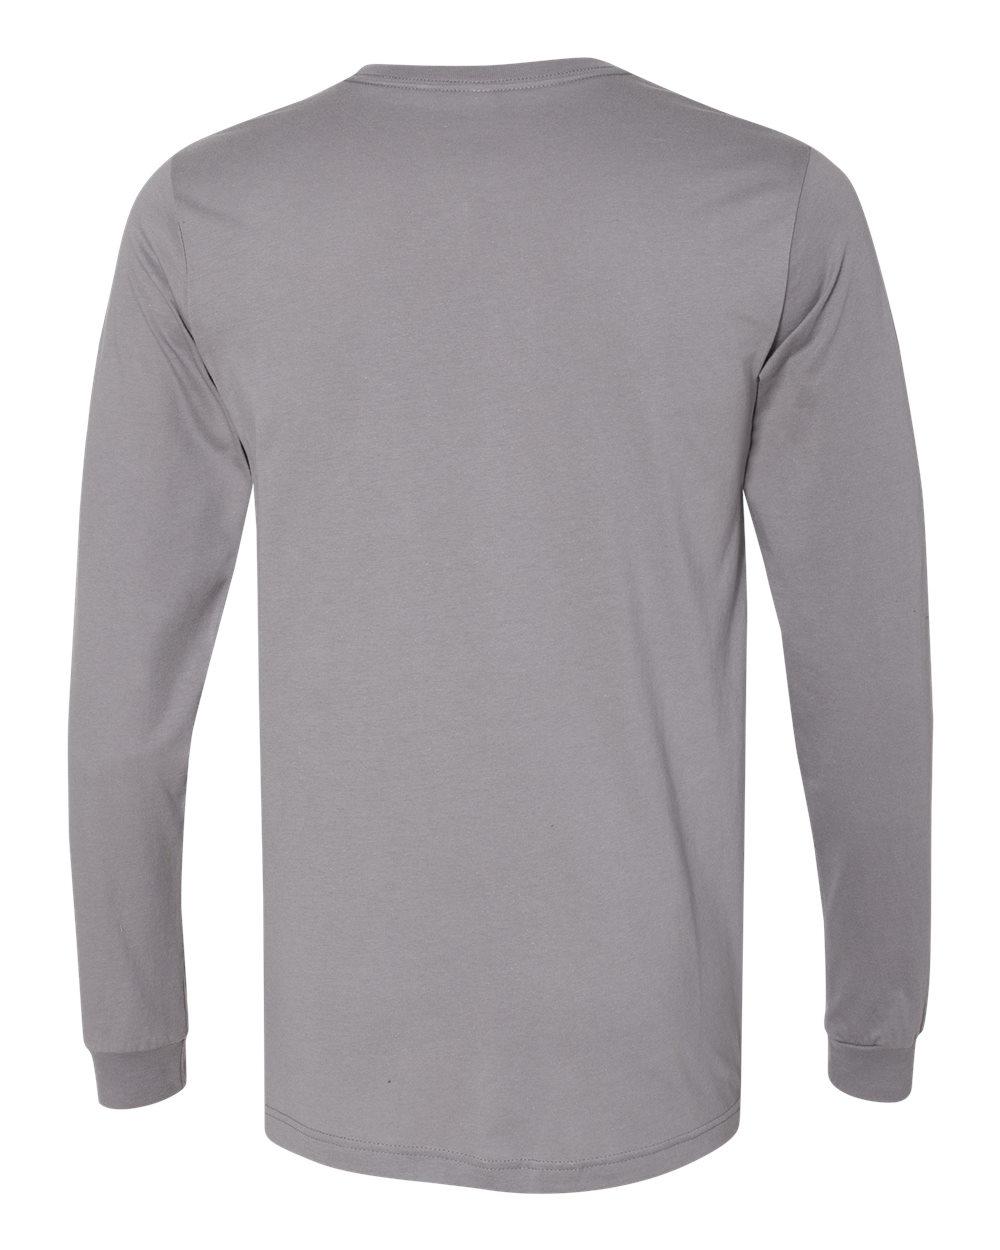 Bella-Canvas-Mens-Blank-Top-Long-Sleeve-Jersey-Tee-T-Shirt-3501-up-to-3XL thumbnail 108